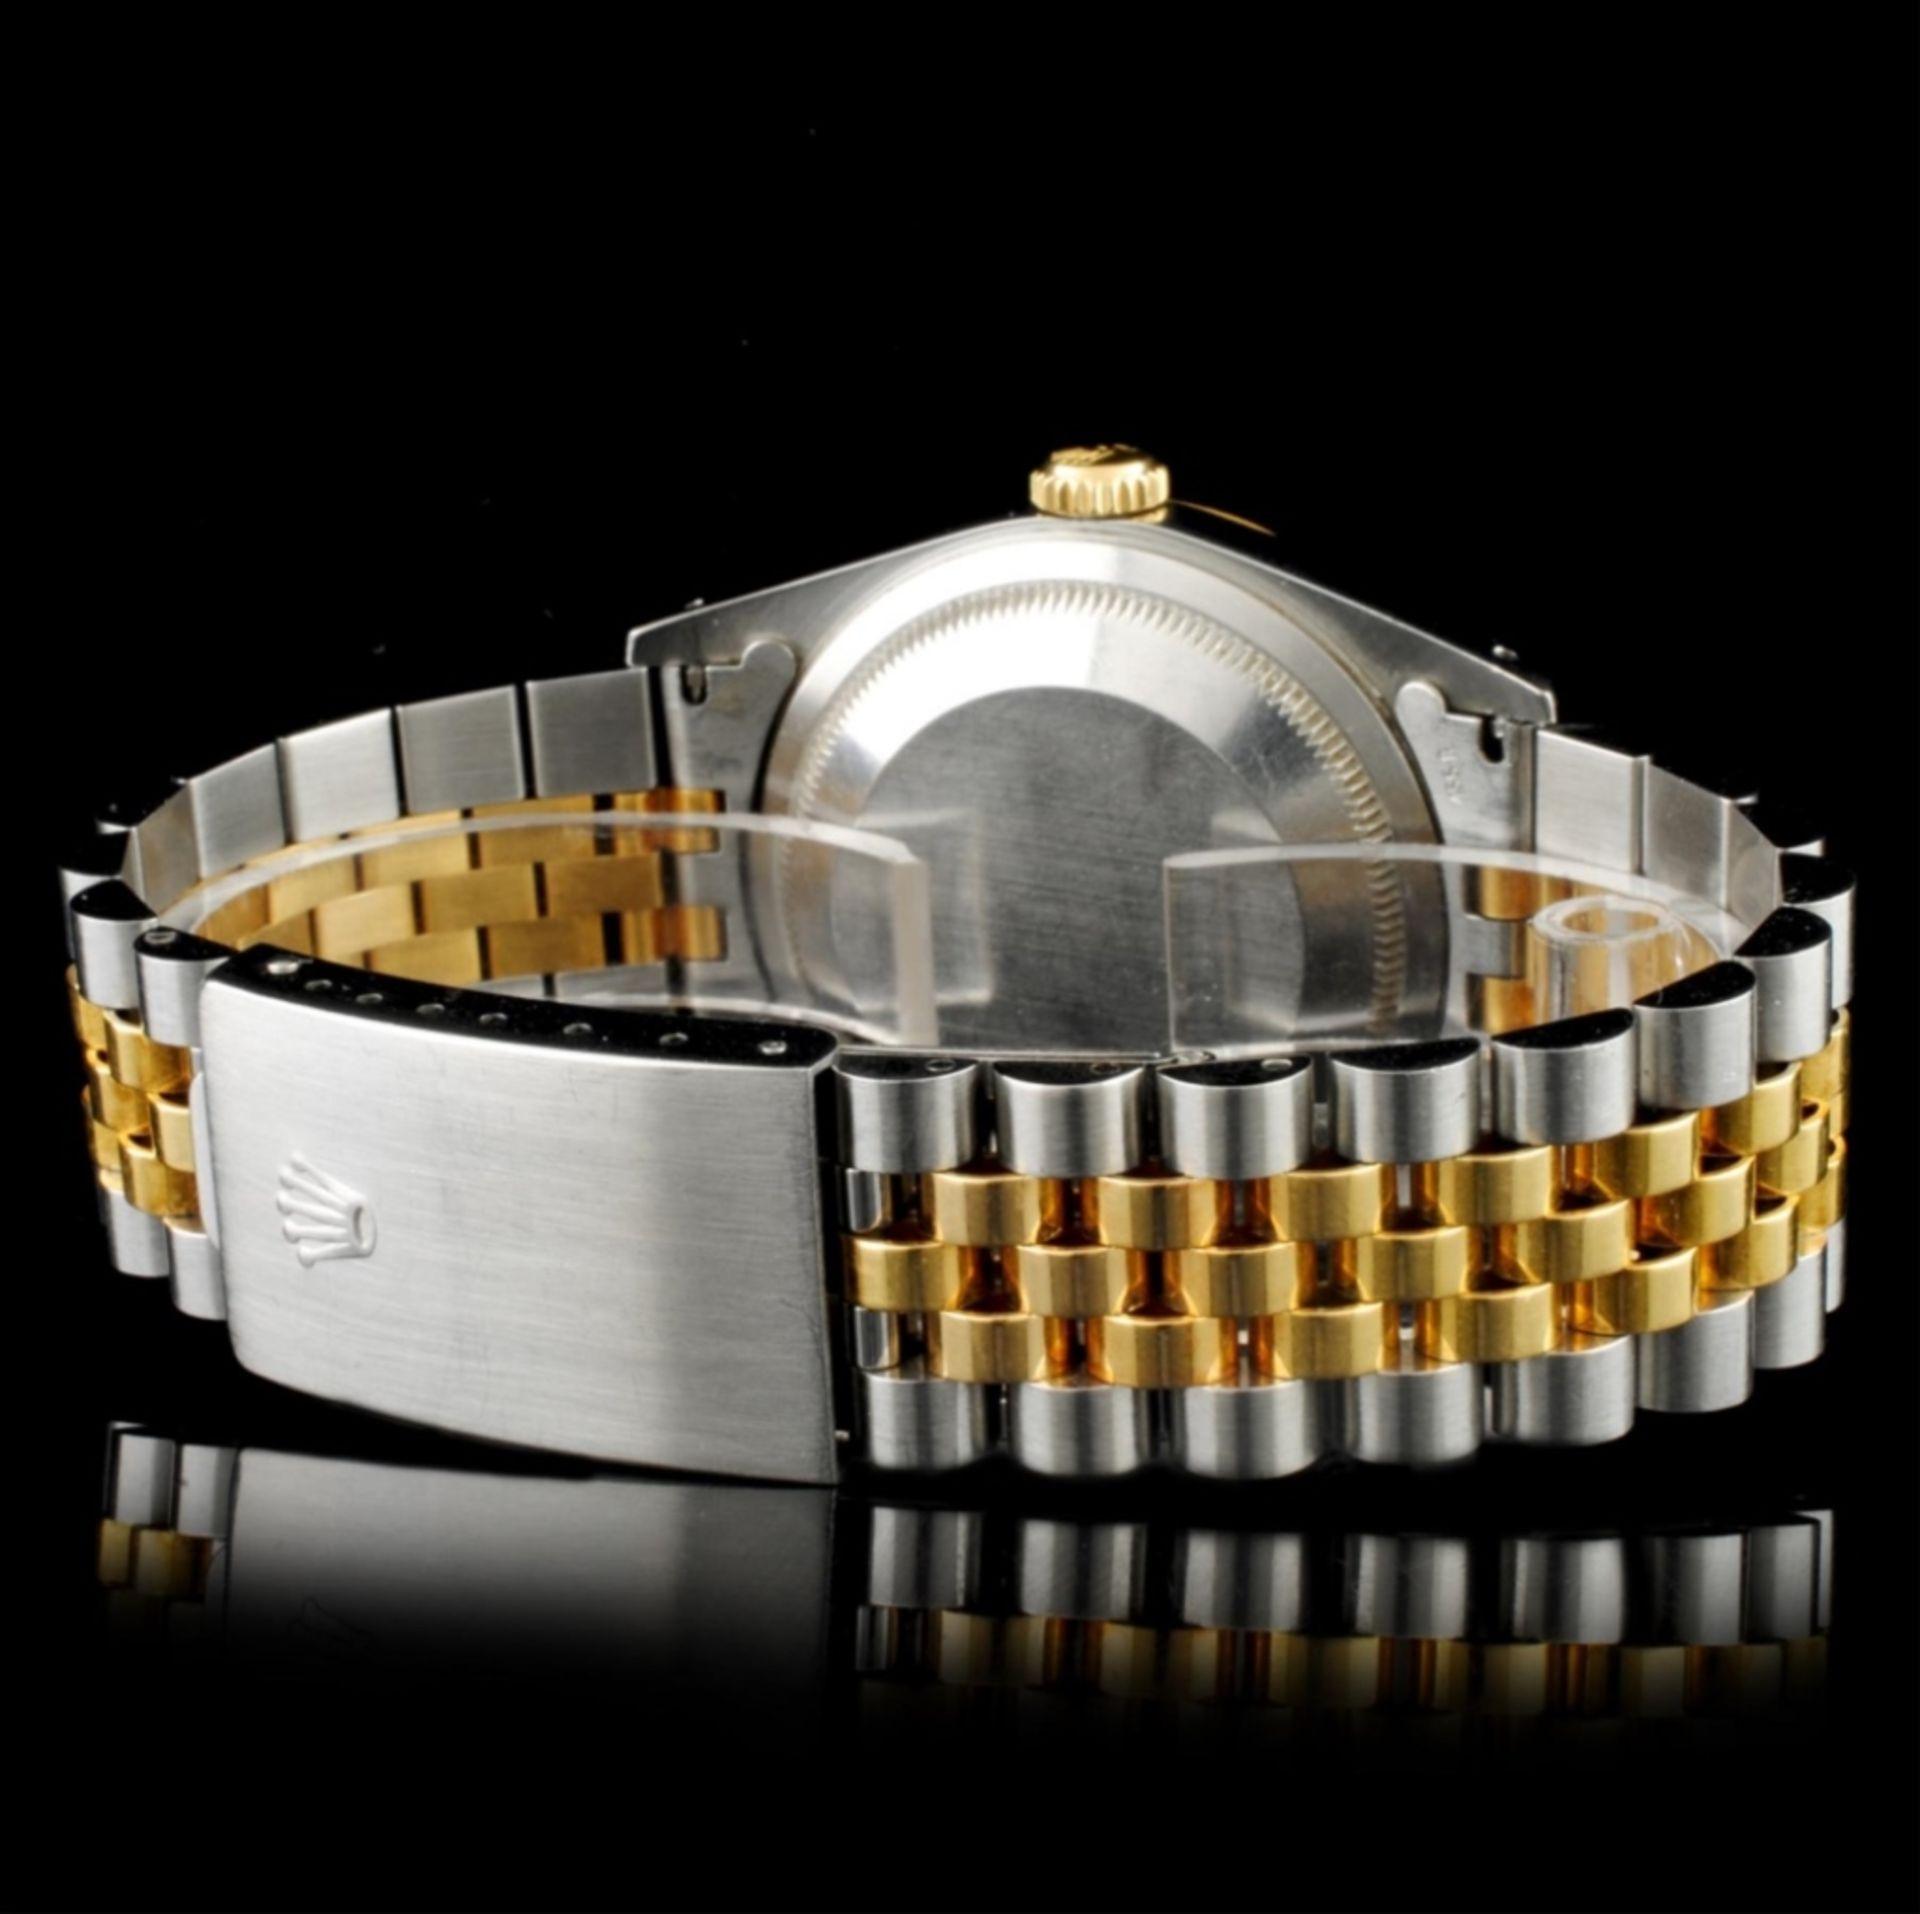 Rolex DateJust YG/SS Diamond 36MM Wristwatch - Image 4 of 5